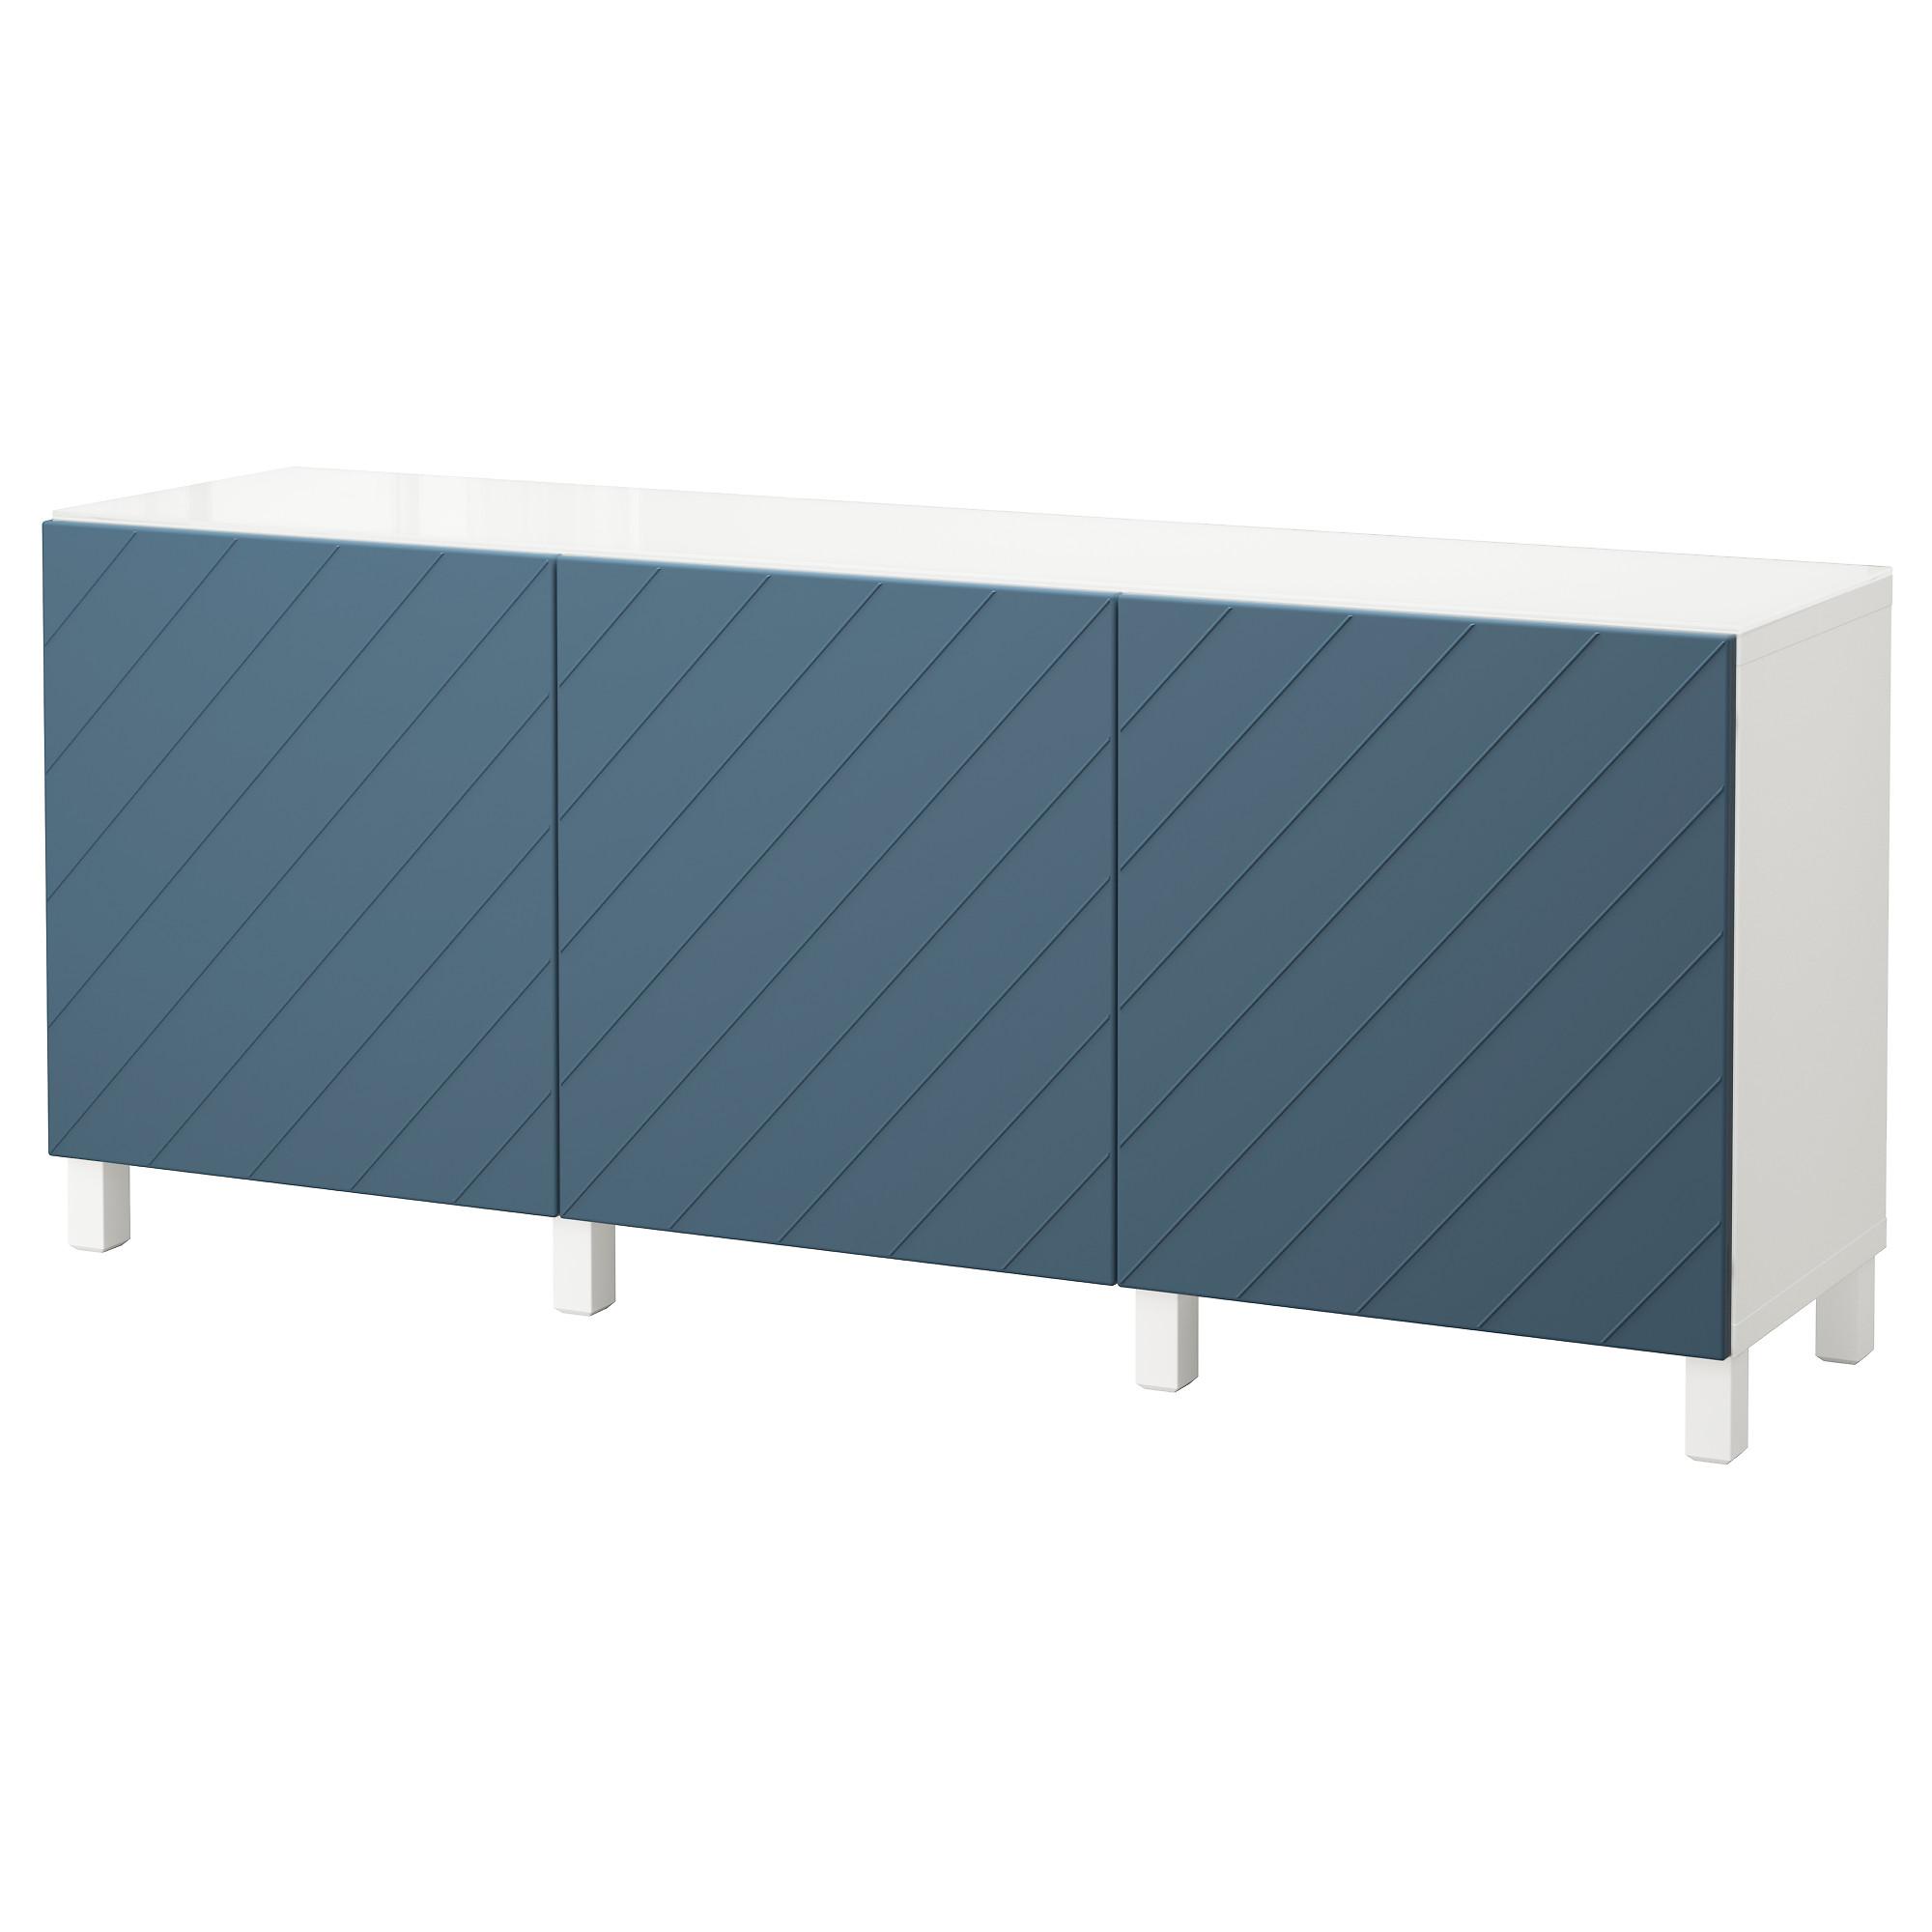 Комбинация для хранения с дверцами БЕСТО темно-синий артикуль № 792.760.67 в наличии. Online каталог IKEA Республика Беларусь. Быстрая доставка и установка.